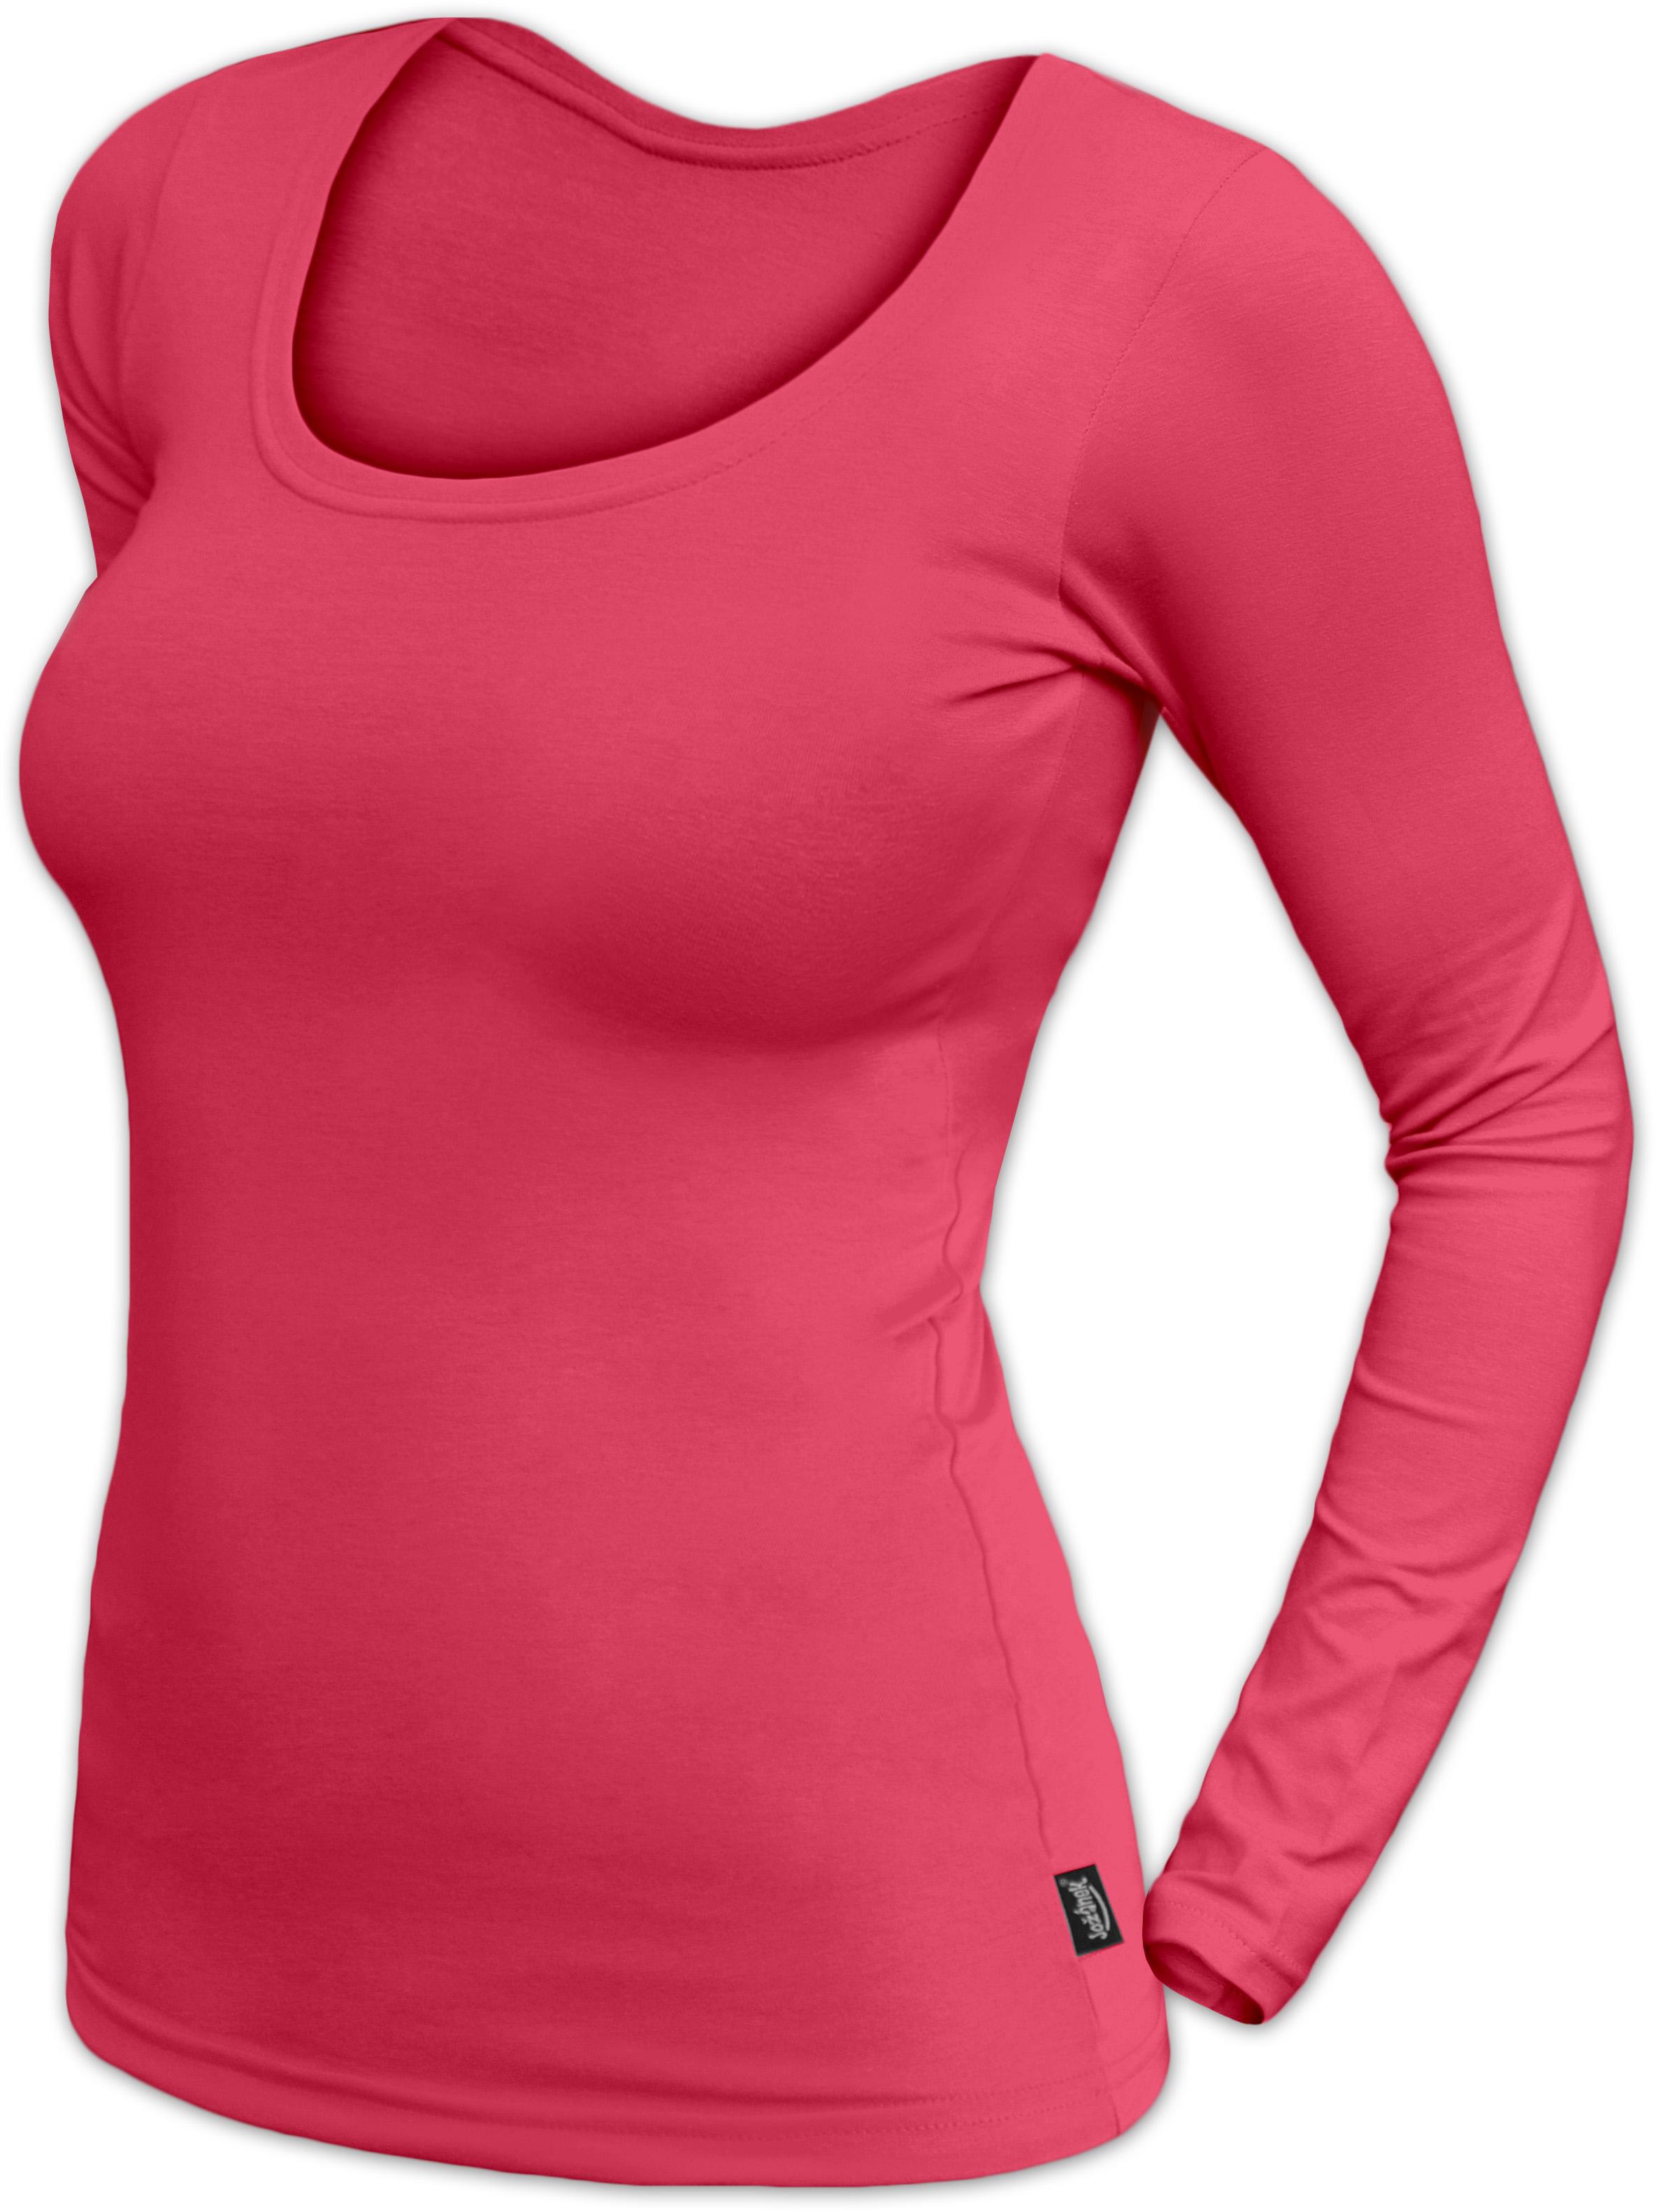 Dámské tričko Brigita, dlouhý rukáv, lososově růžová